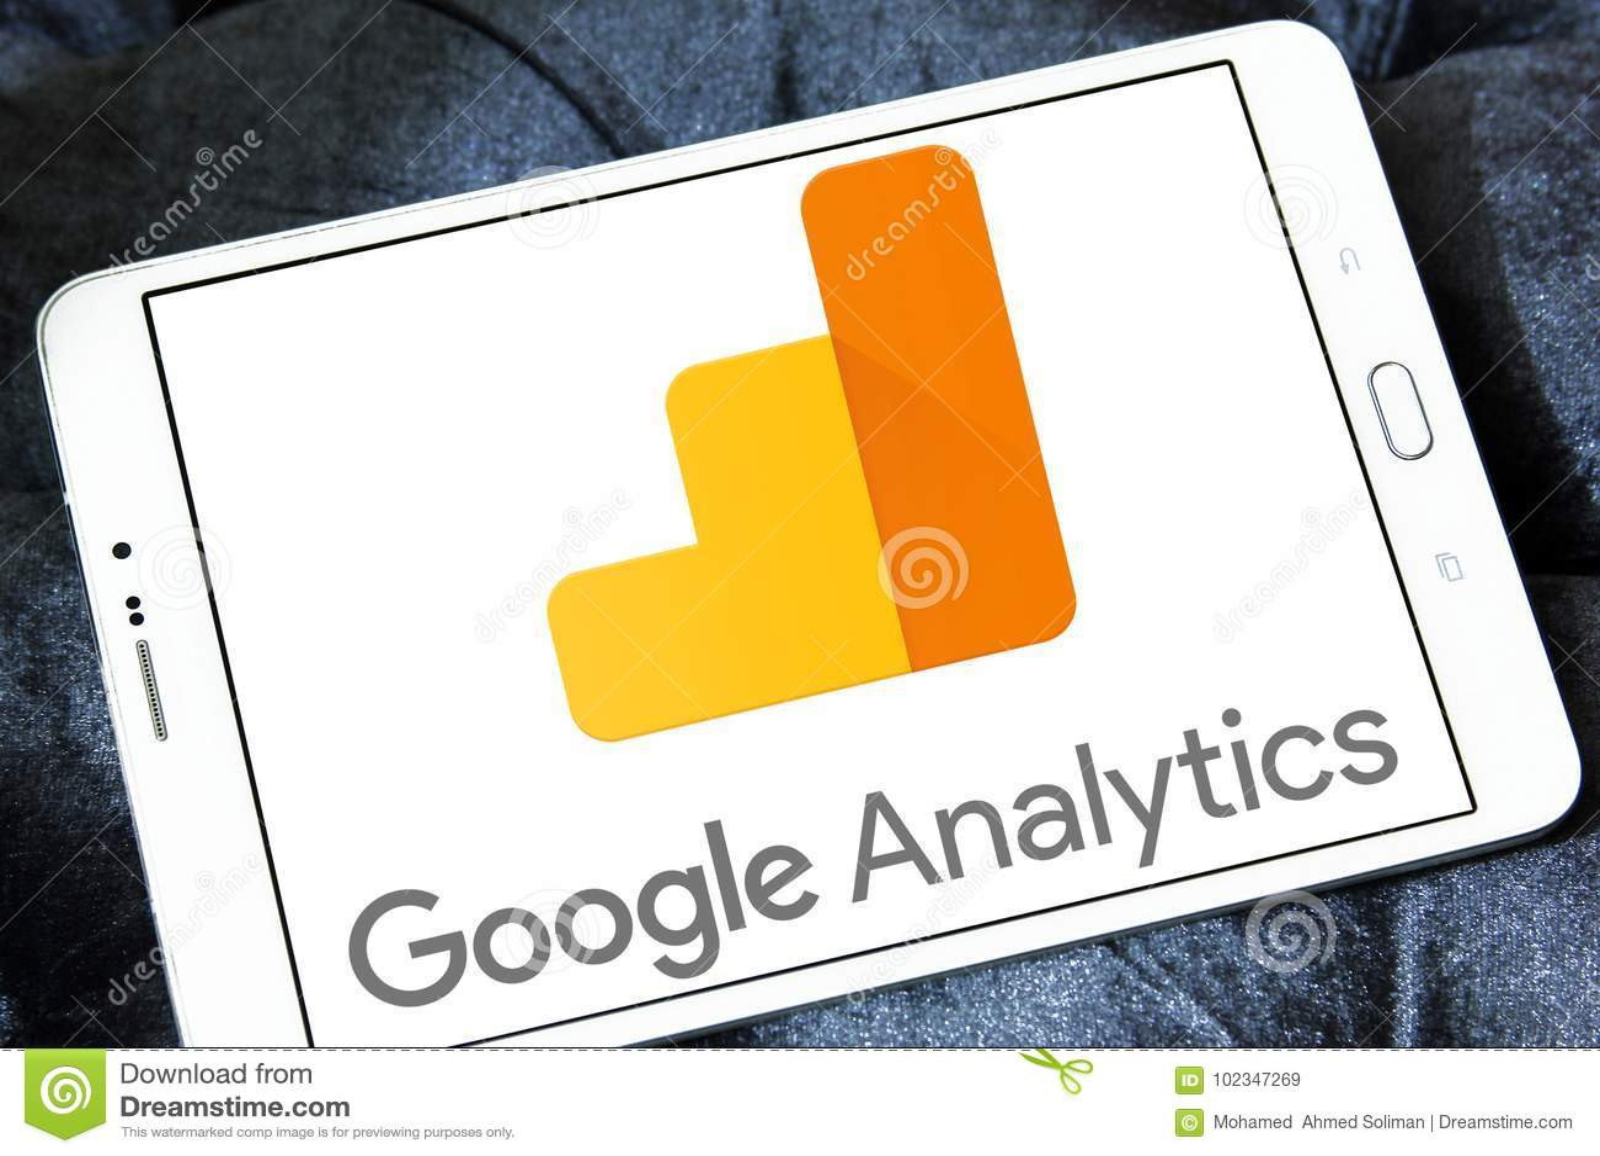 Google Analytics logo editorial stock image  Image of data - 102347269